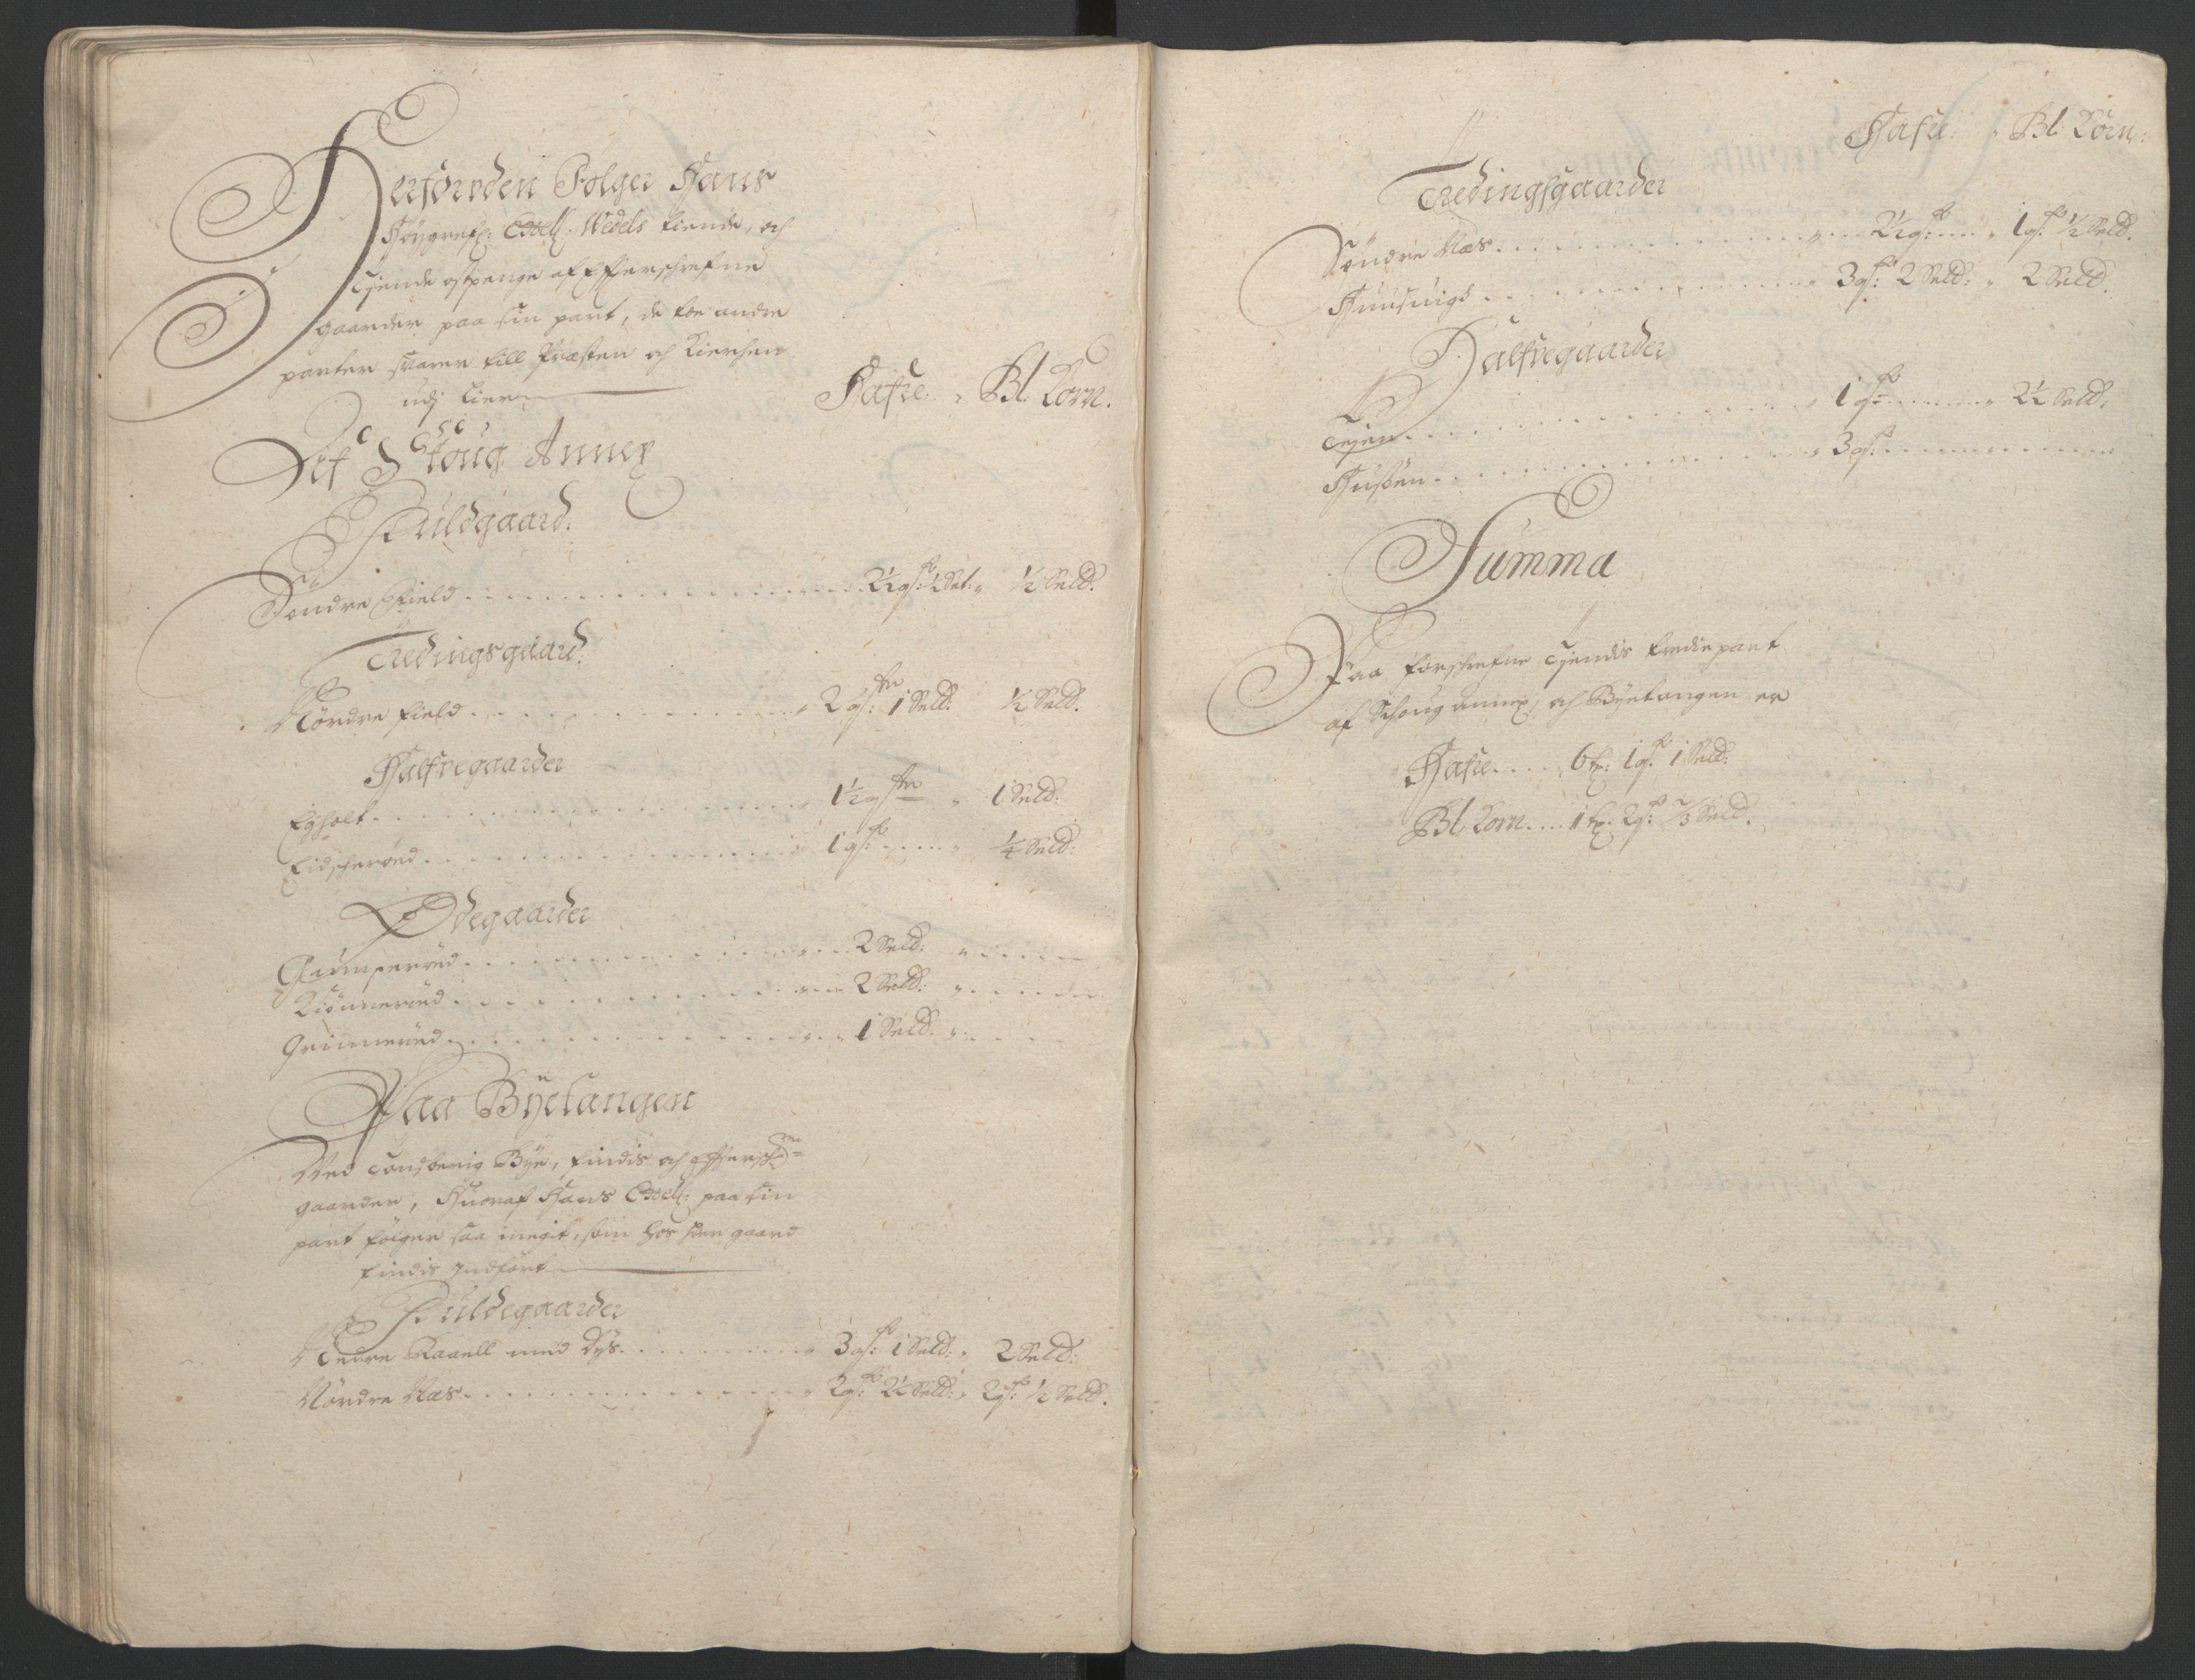 RA, Rentekammeret inntil 1814, Reviderte regnskaper, Fogderegnskap, R32/L1865: Fogderegnskap Jarlsberg grevskap, 1692, s. 414